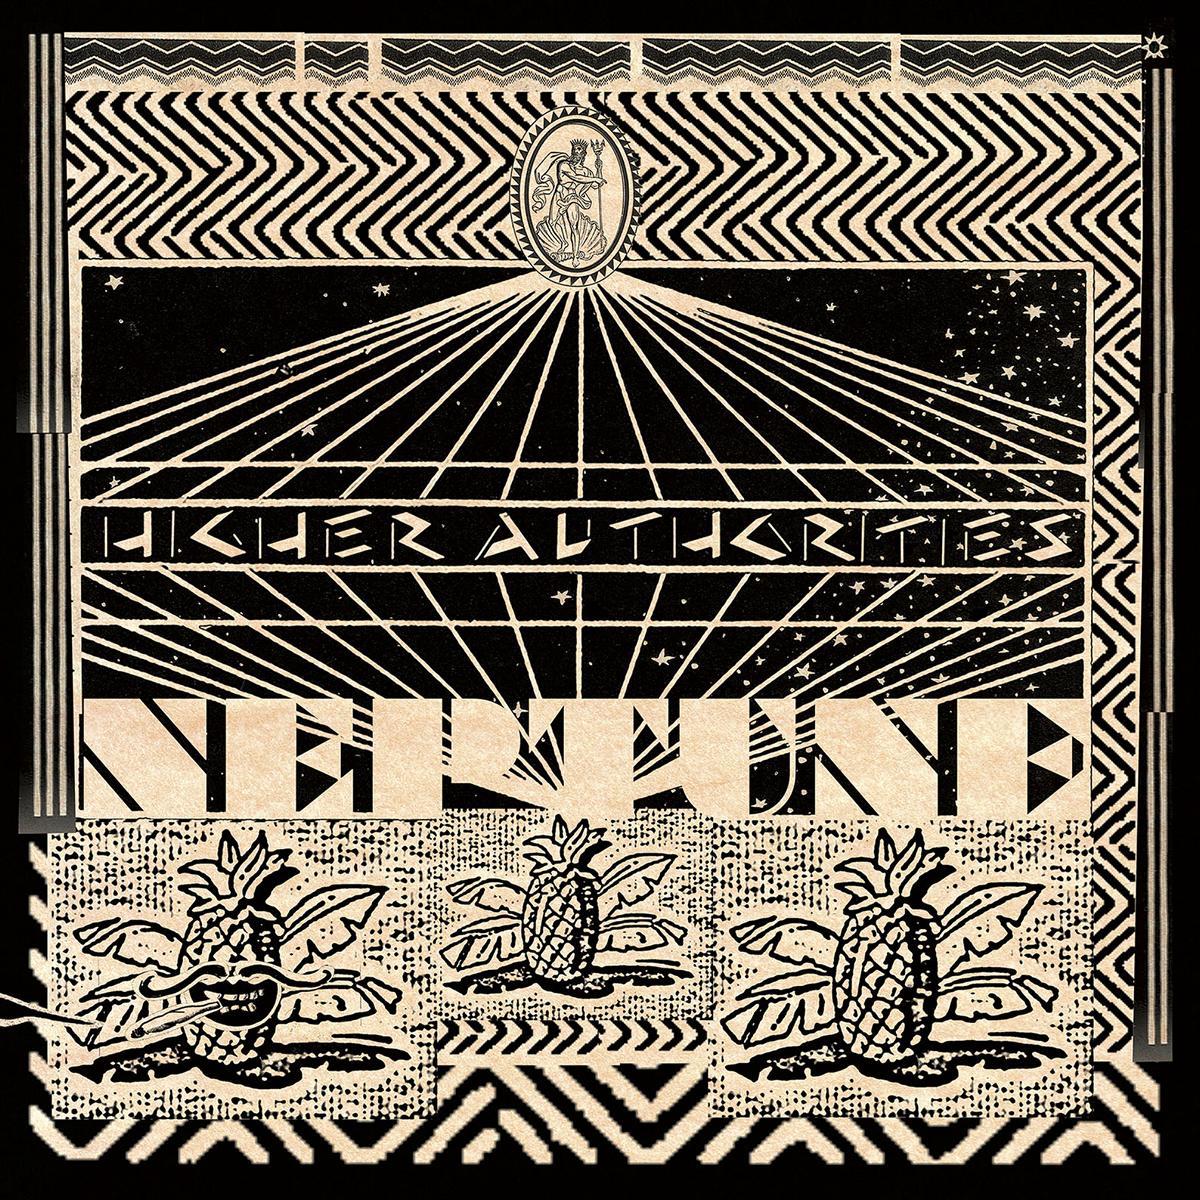 Albumcover: Higher Authorities -- Neptune